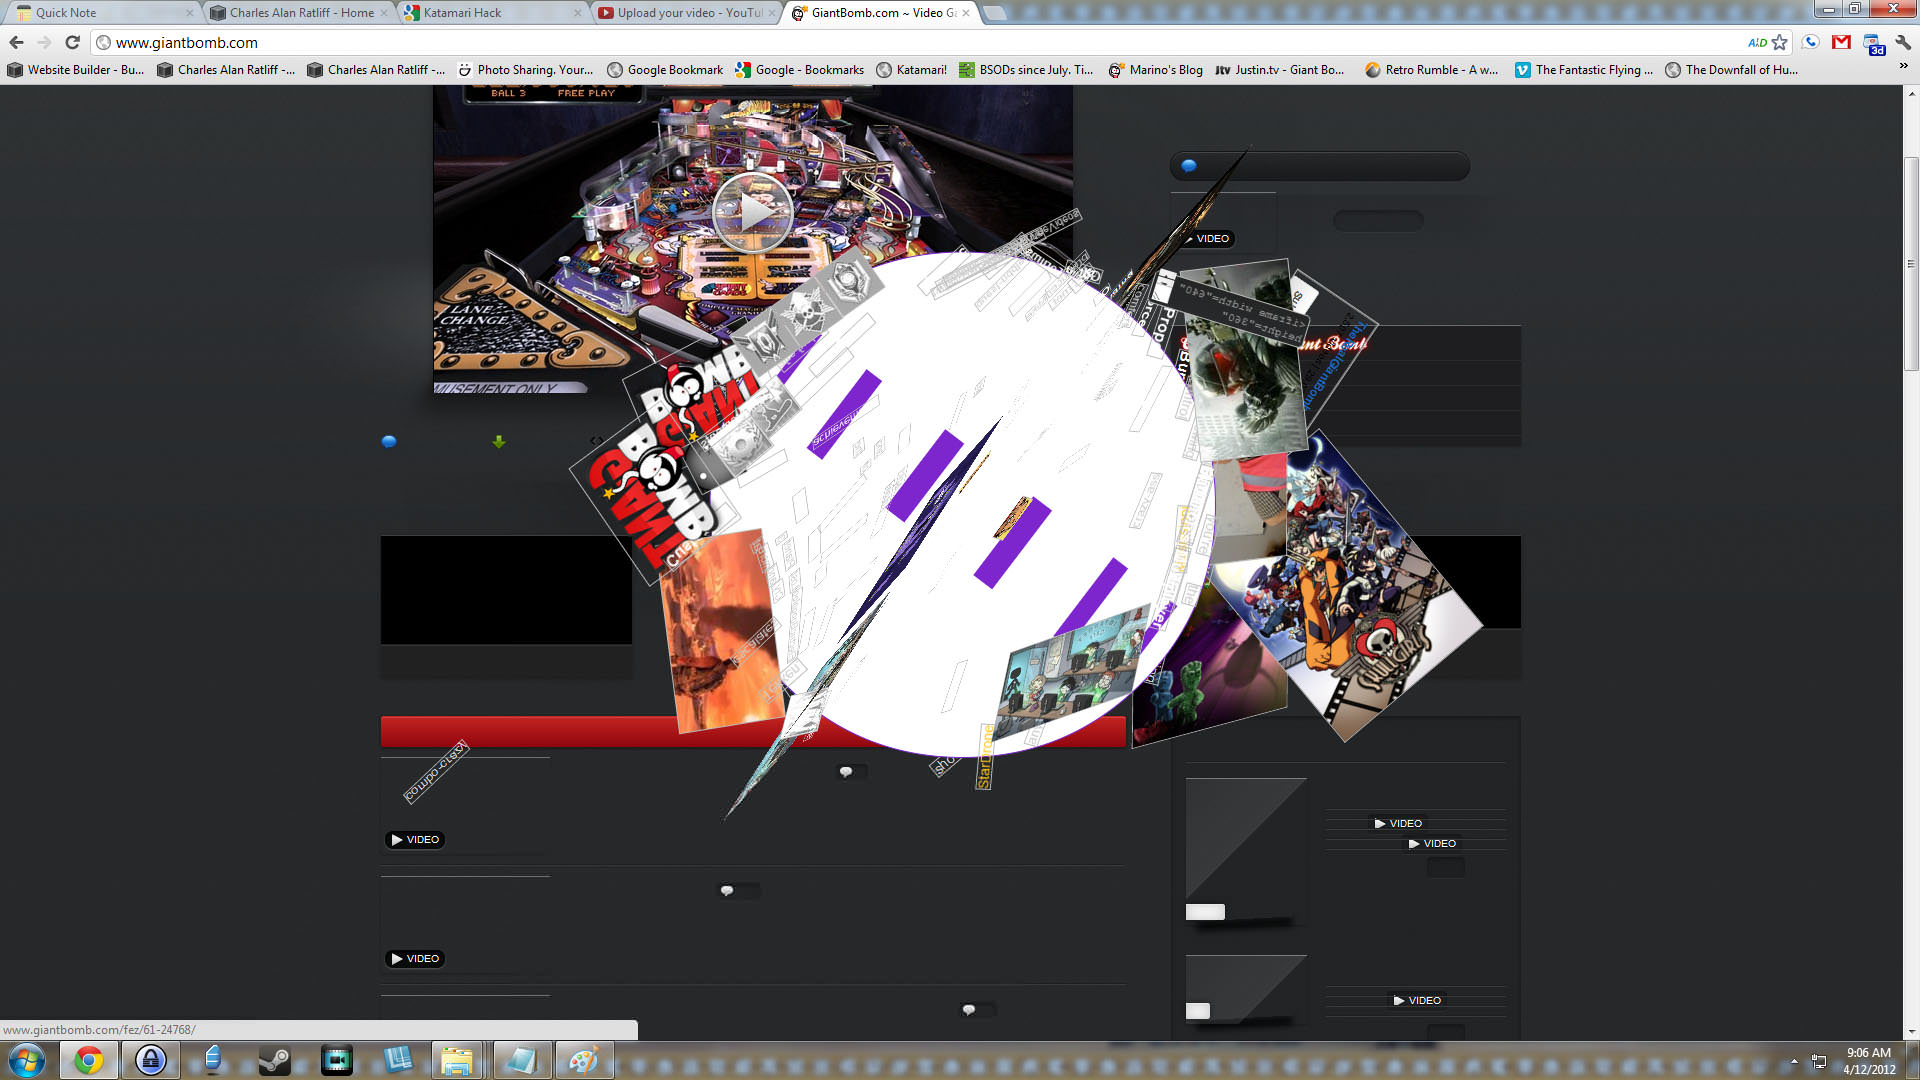 Using Katamari Hack on Giant Bomb.